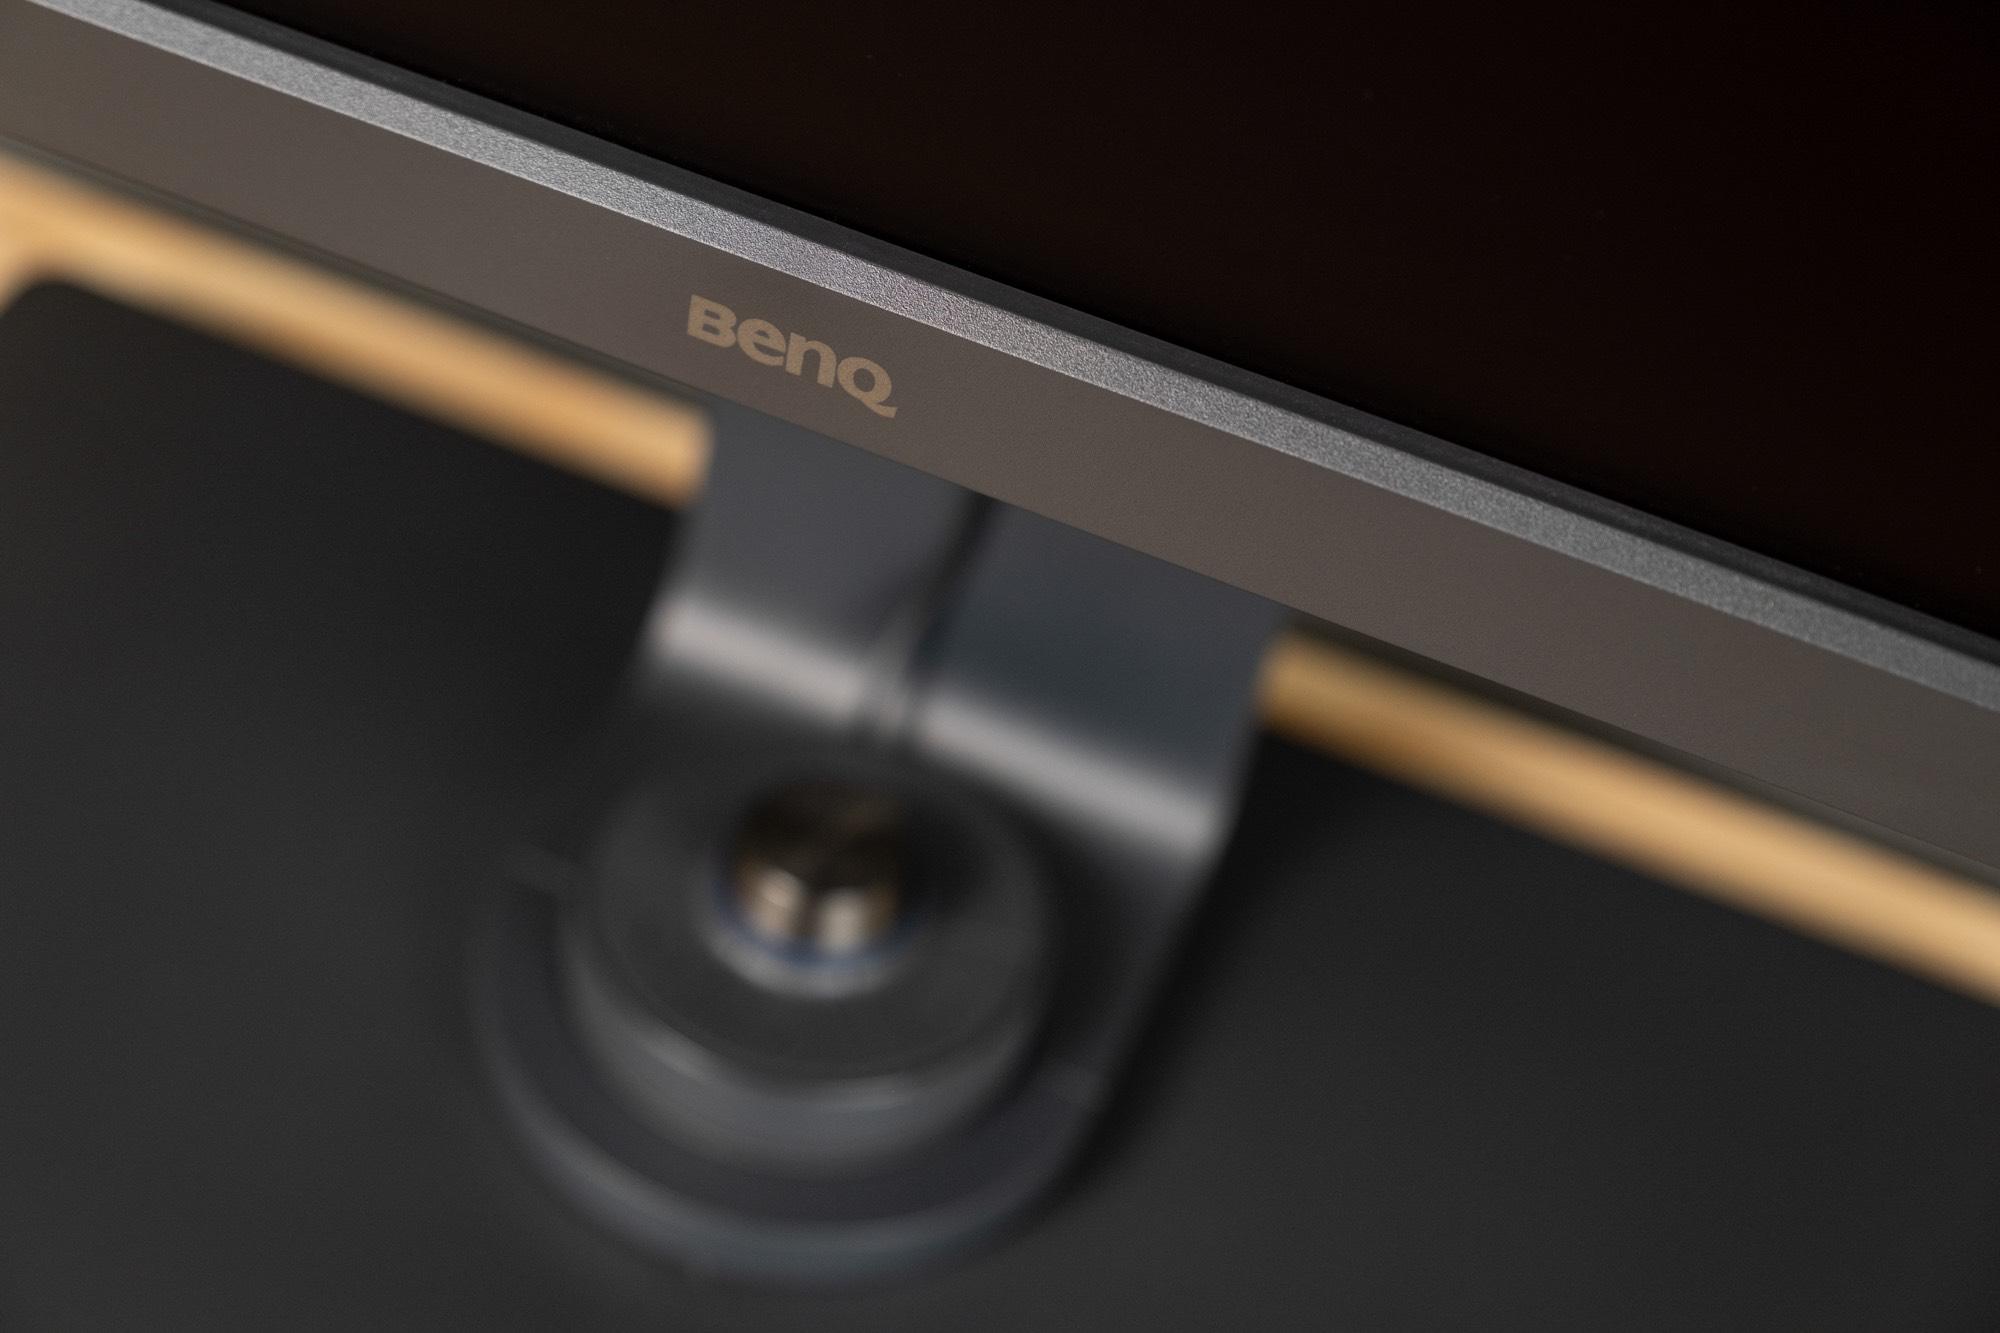 BenQ Monitor Product Photography Singapore COCO Creative Studio 2